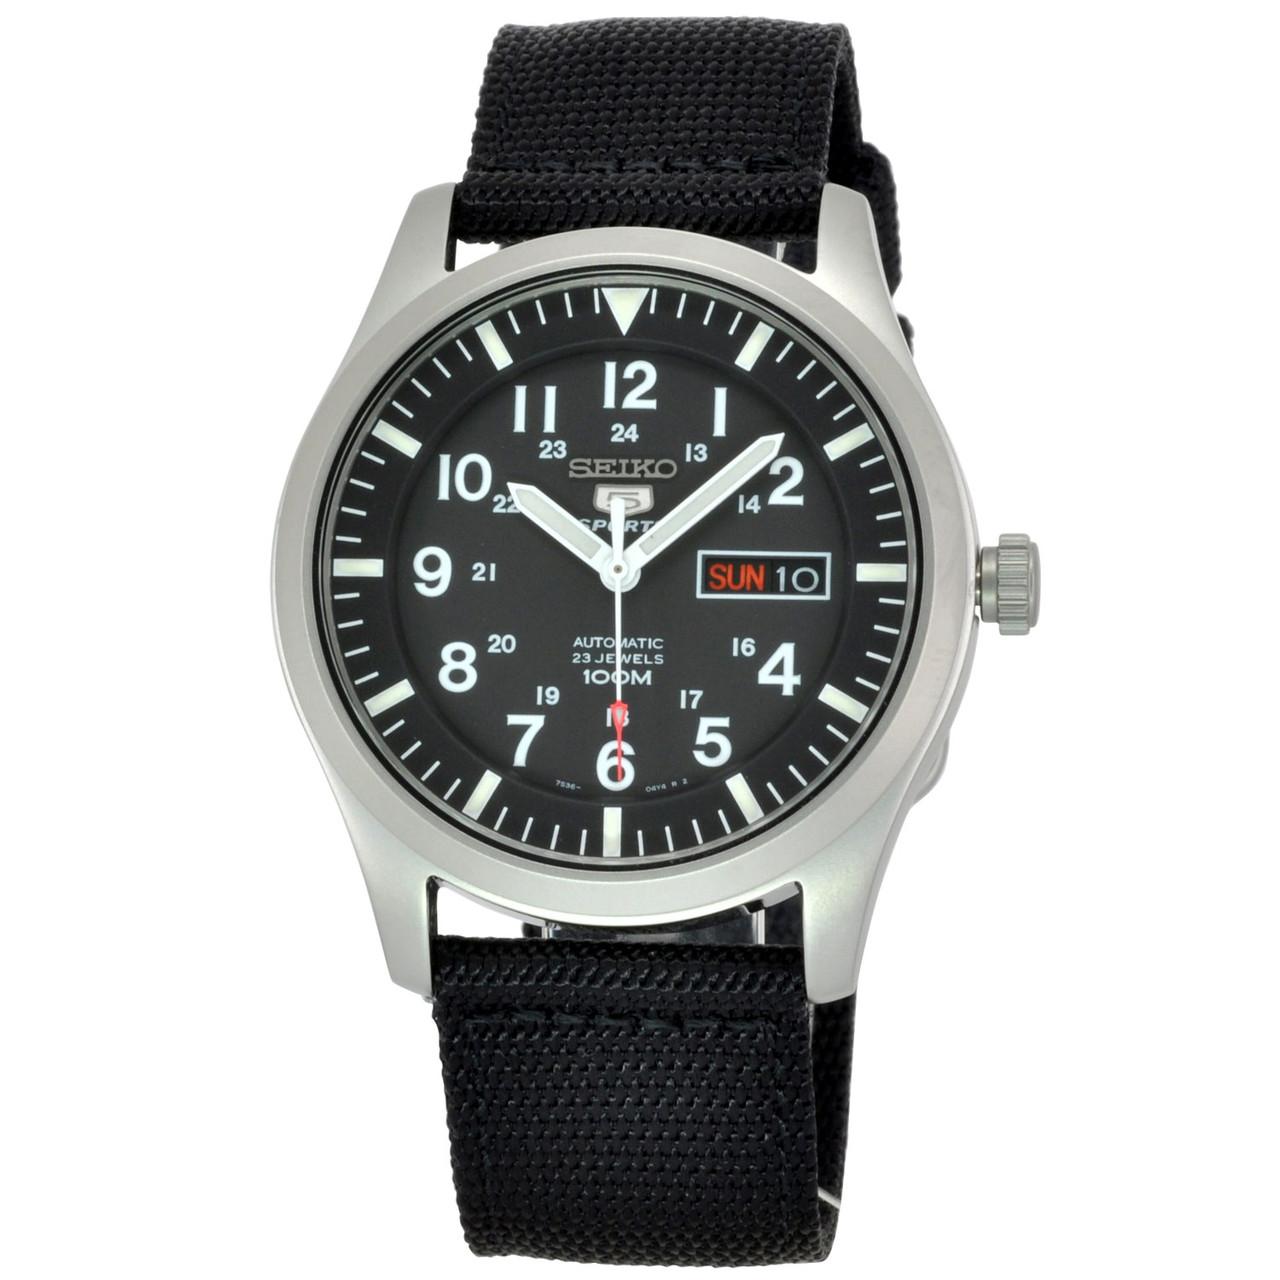 Часы Seiko 5 Military Automatic SNZG15K1